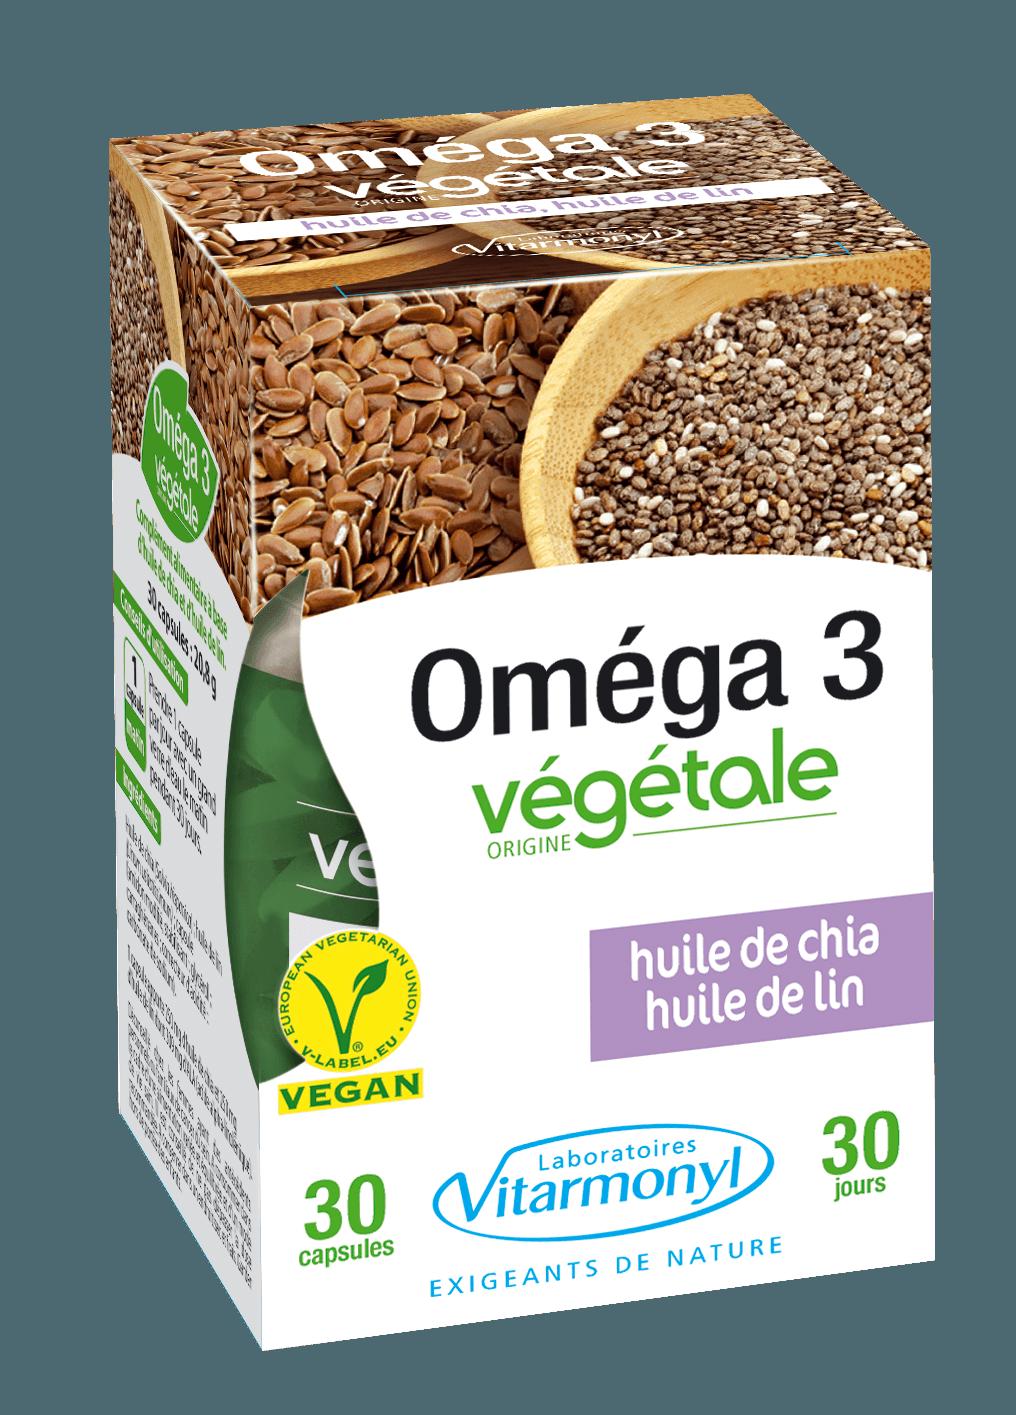 Image Oméga 3 végétal